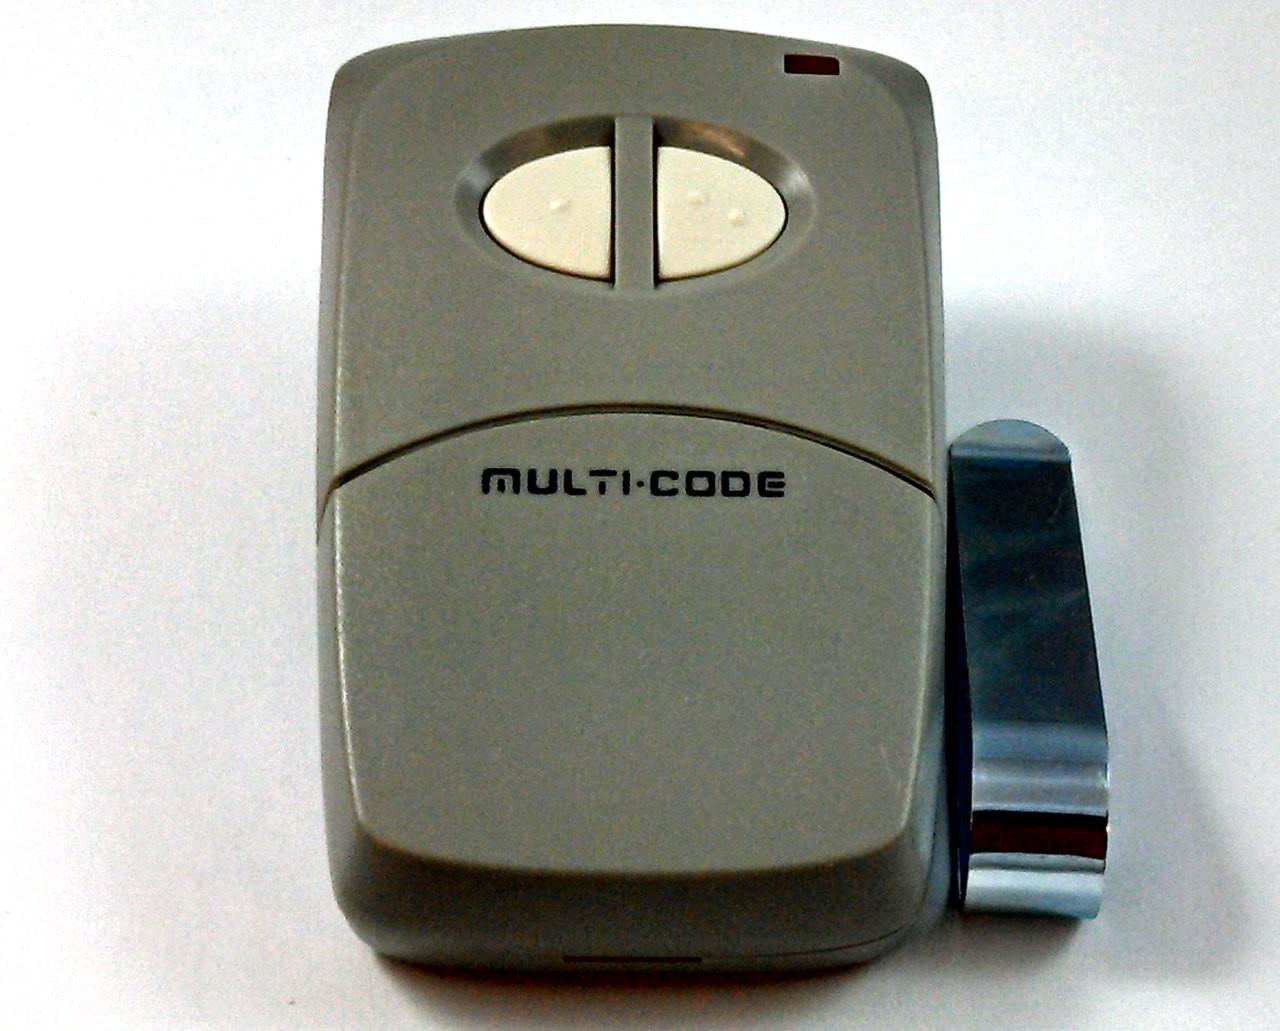 Multi-Code Compatible 300MCD21V2 10 Code Switch 300MHz Gate Garage Door Remote